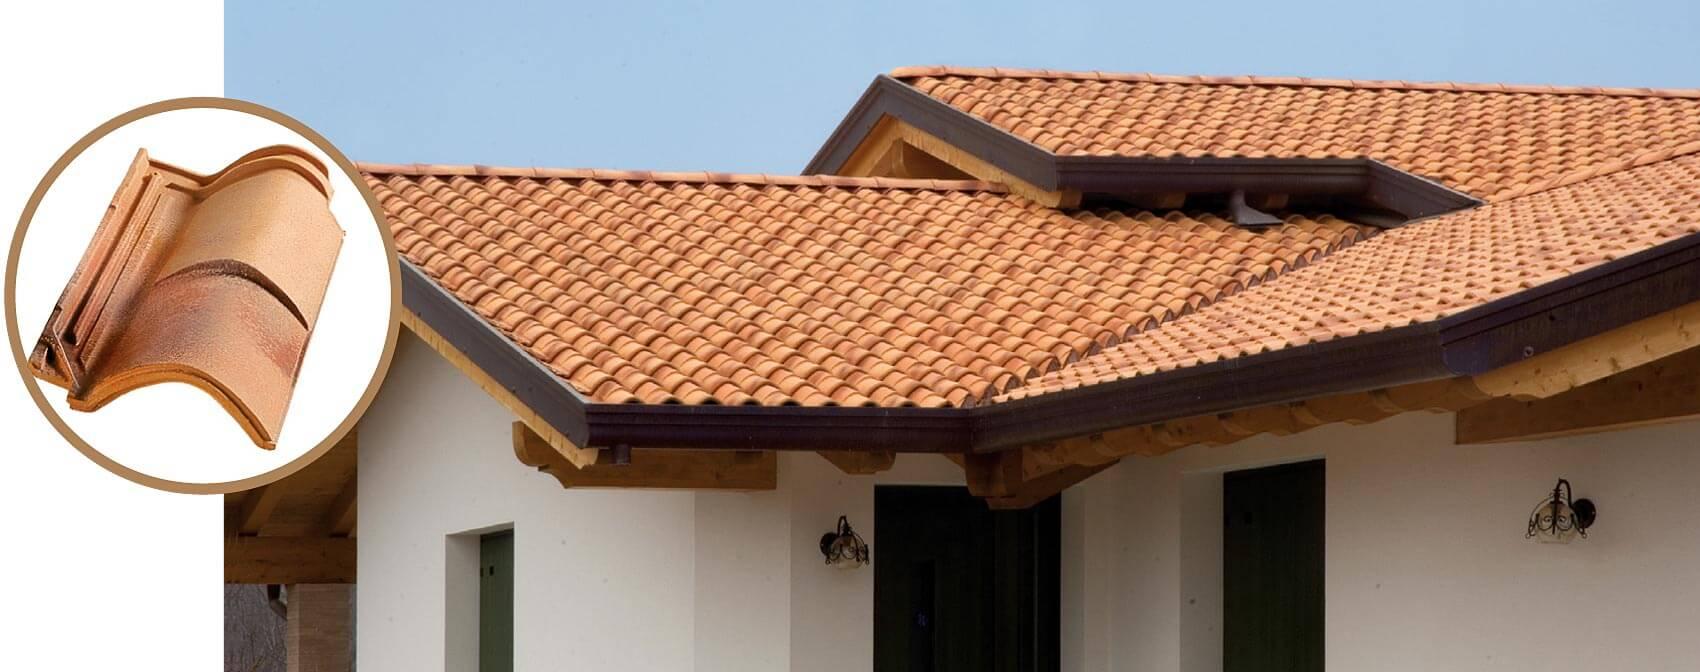 Dachówka firmy Tognana, Royal Coppo, kolor Neobaroque.